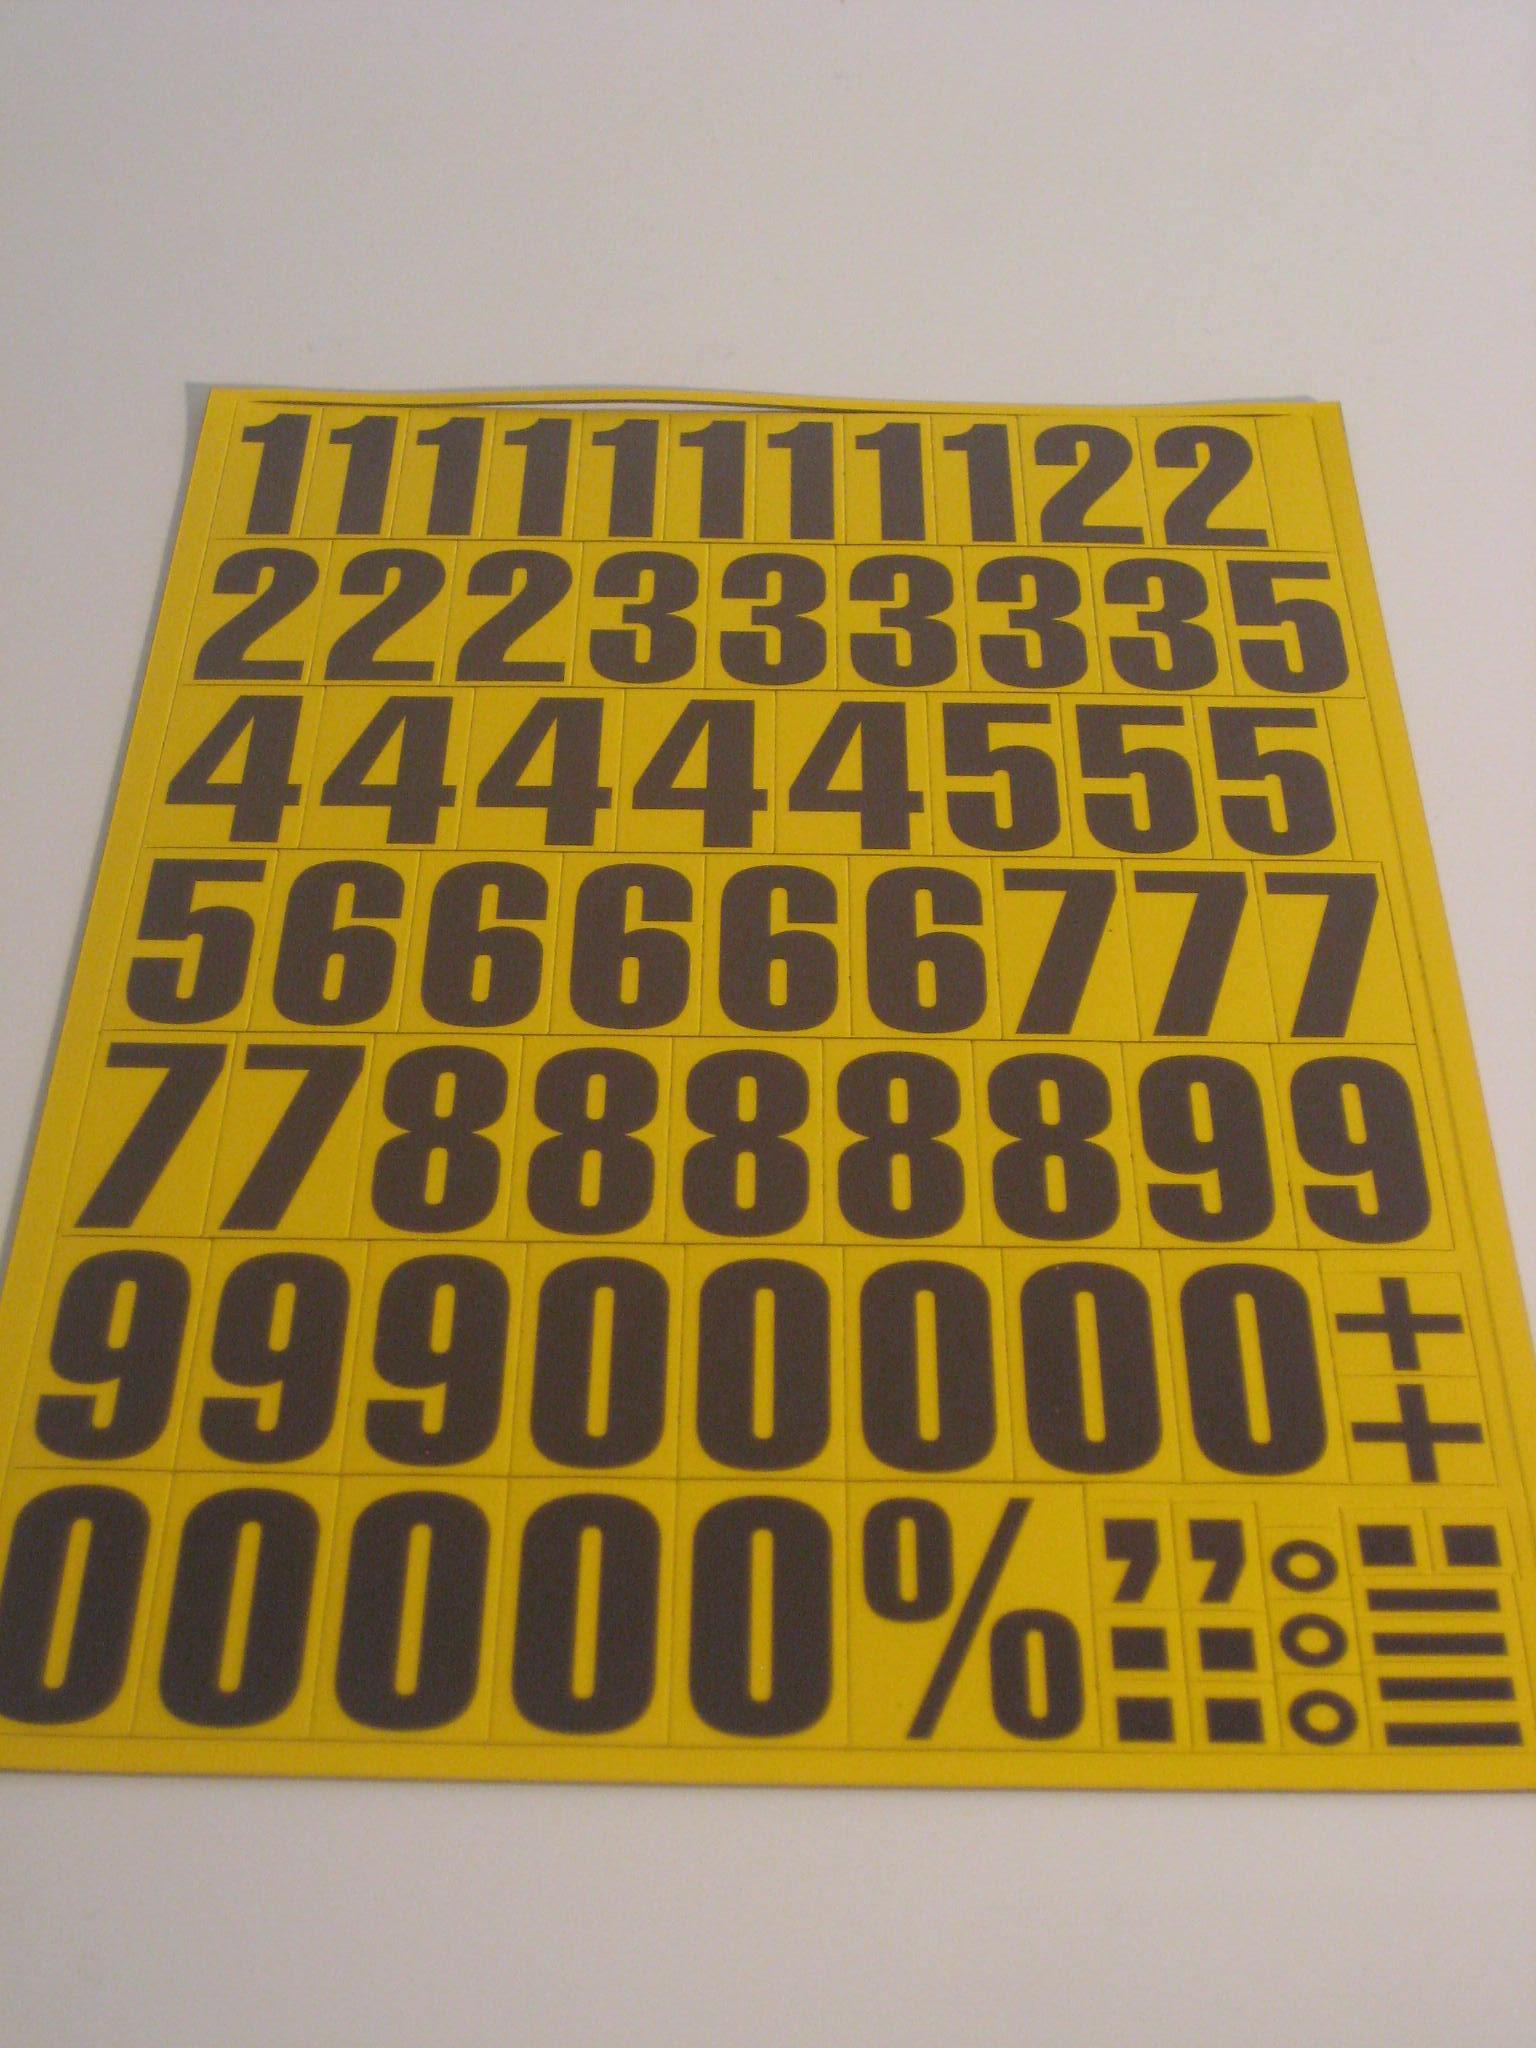 43mm black printed magnetic numbers on yellow vinyl